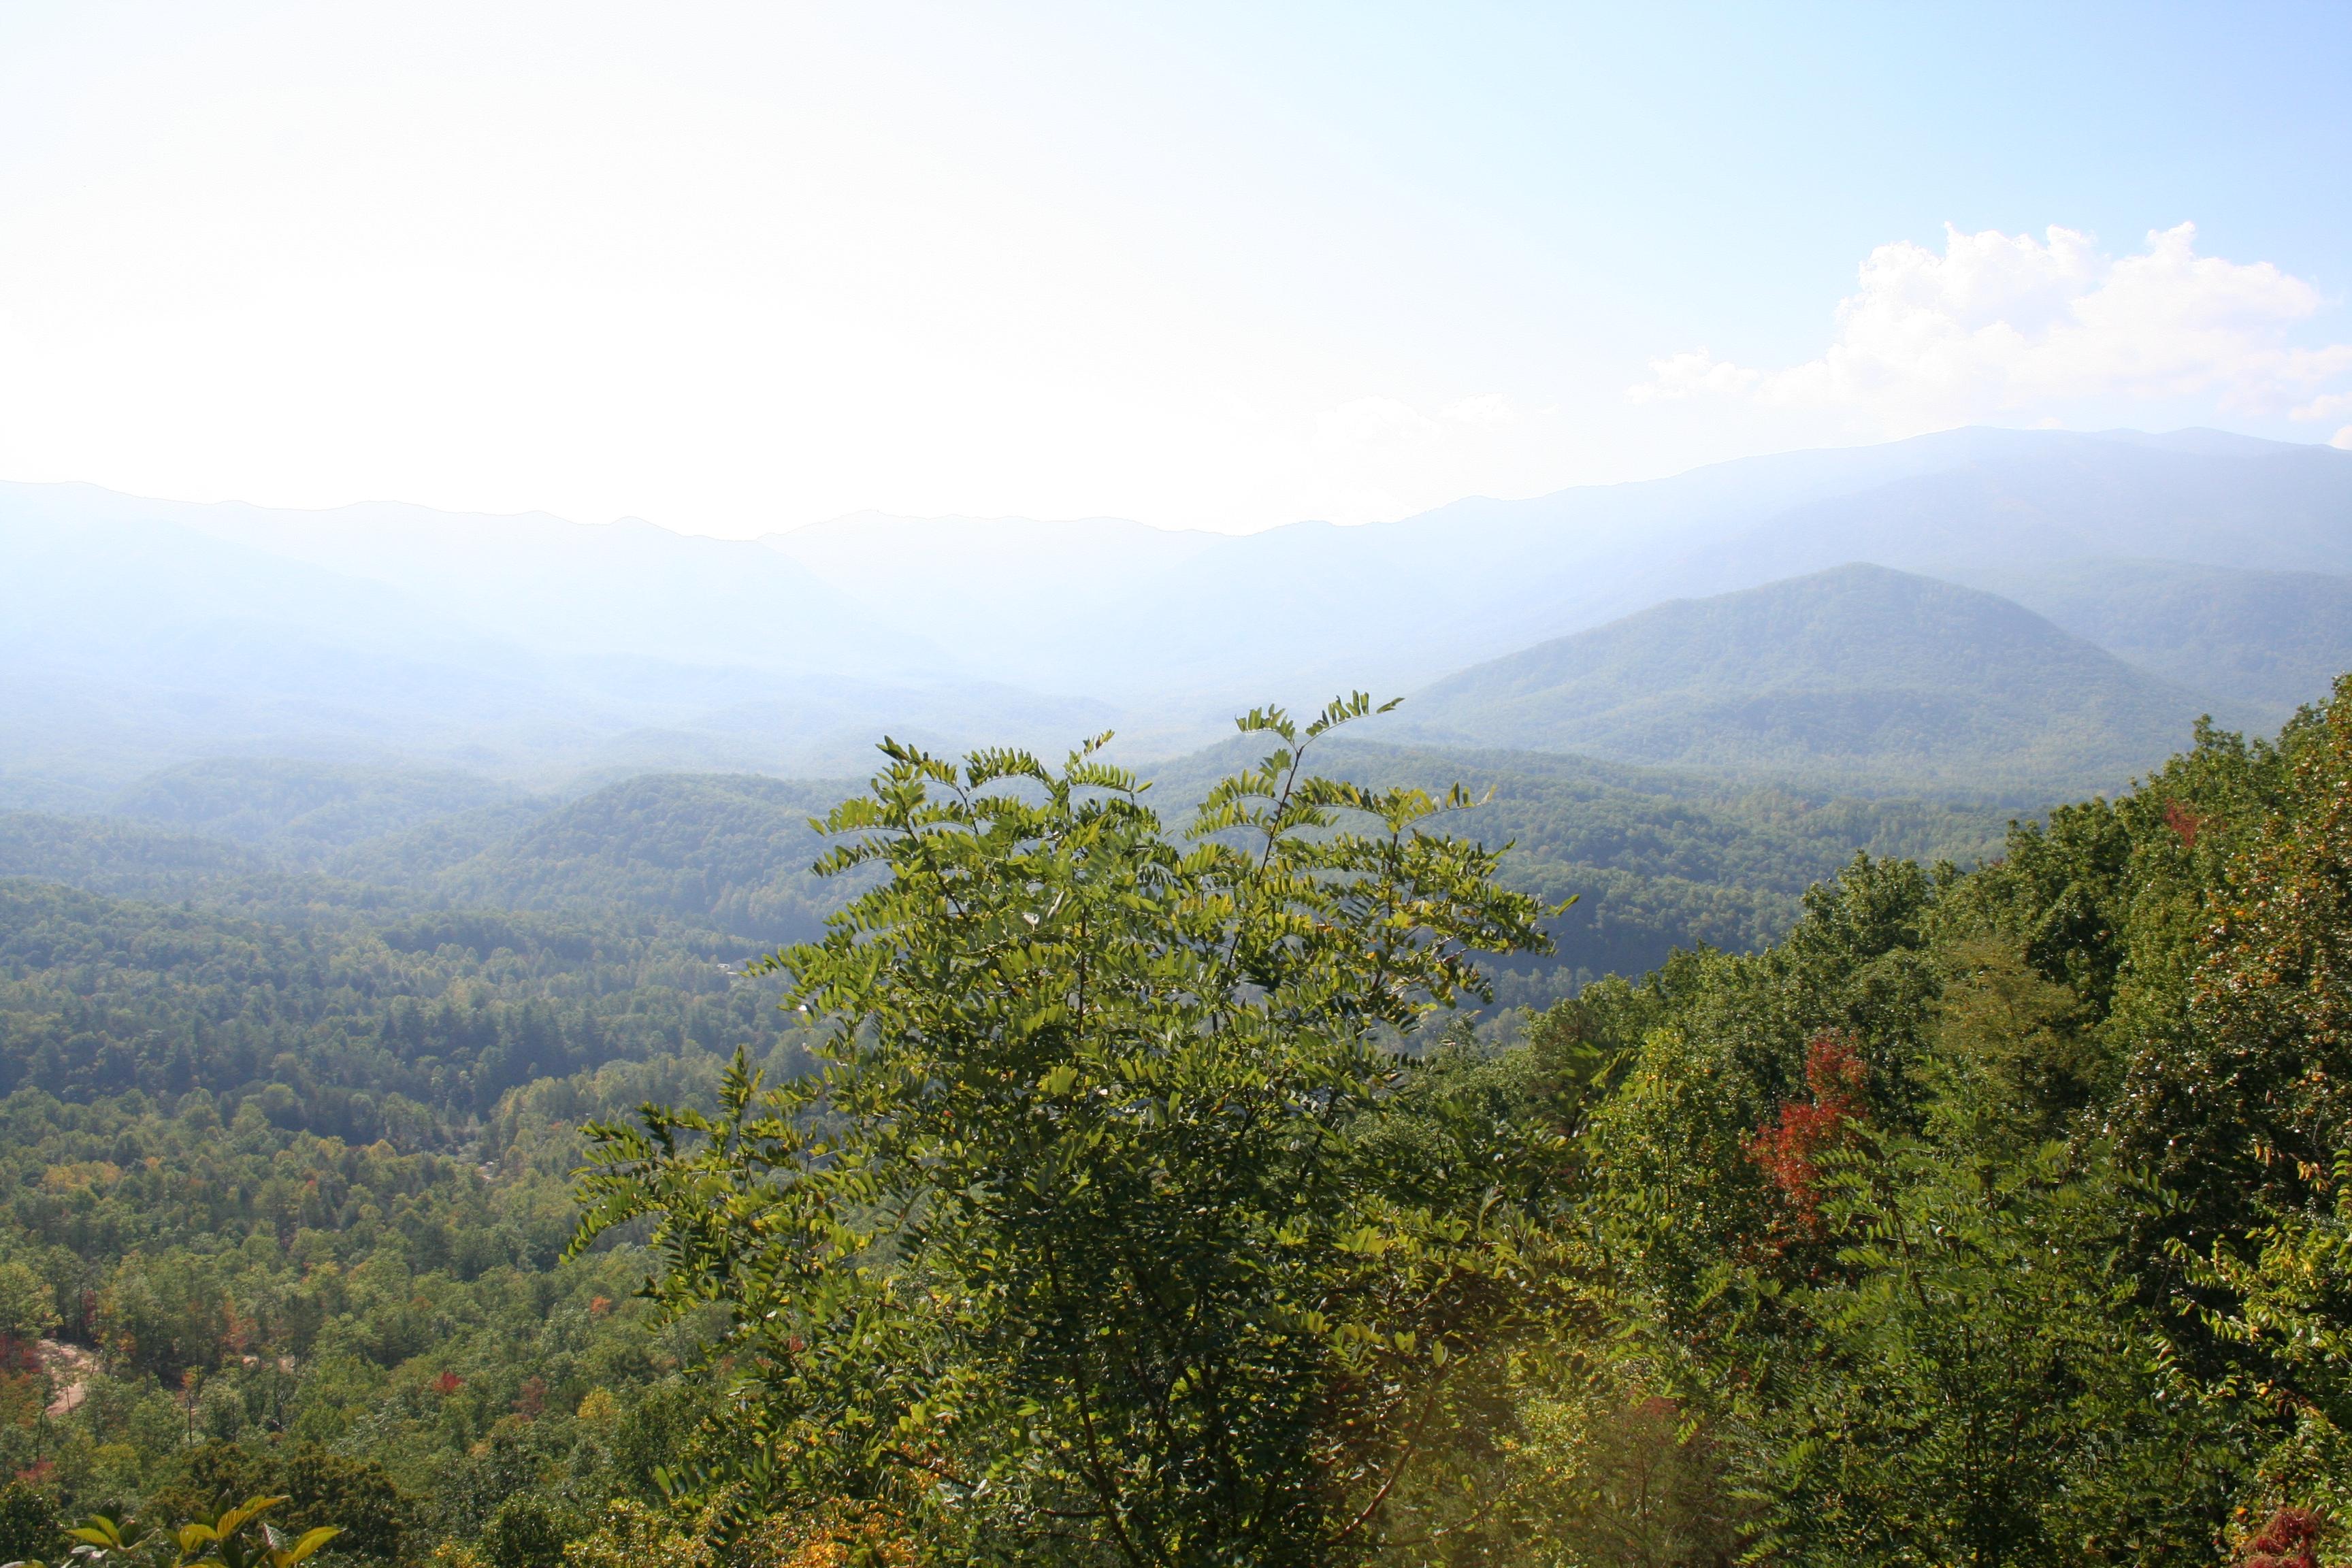 Newport / I-40 / Smoky Mountains KOA Journey image 20